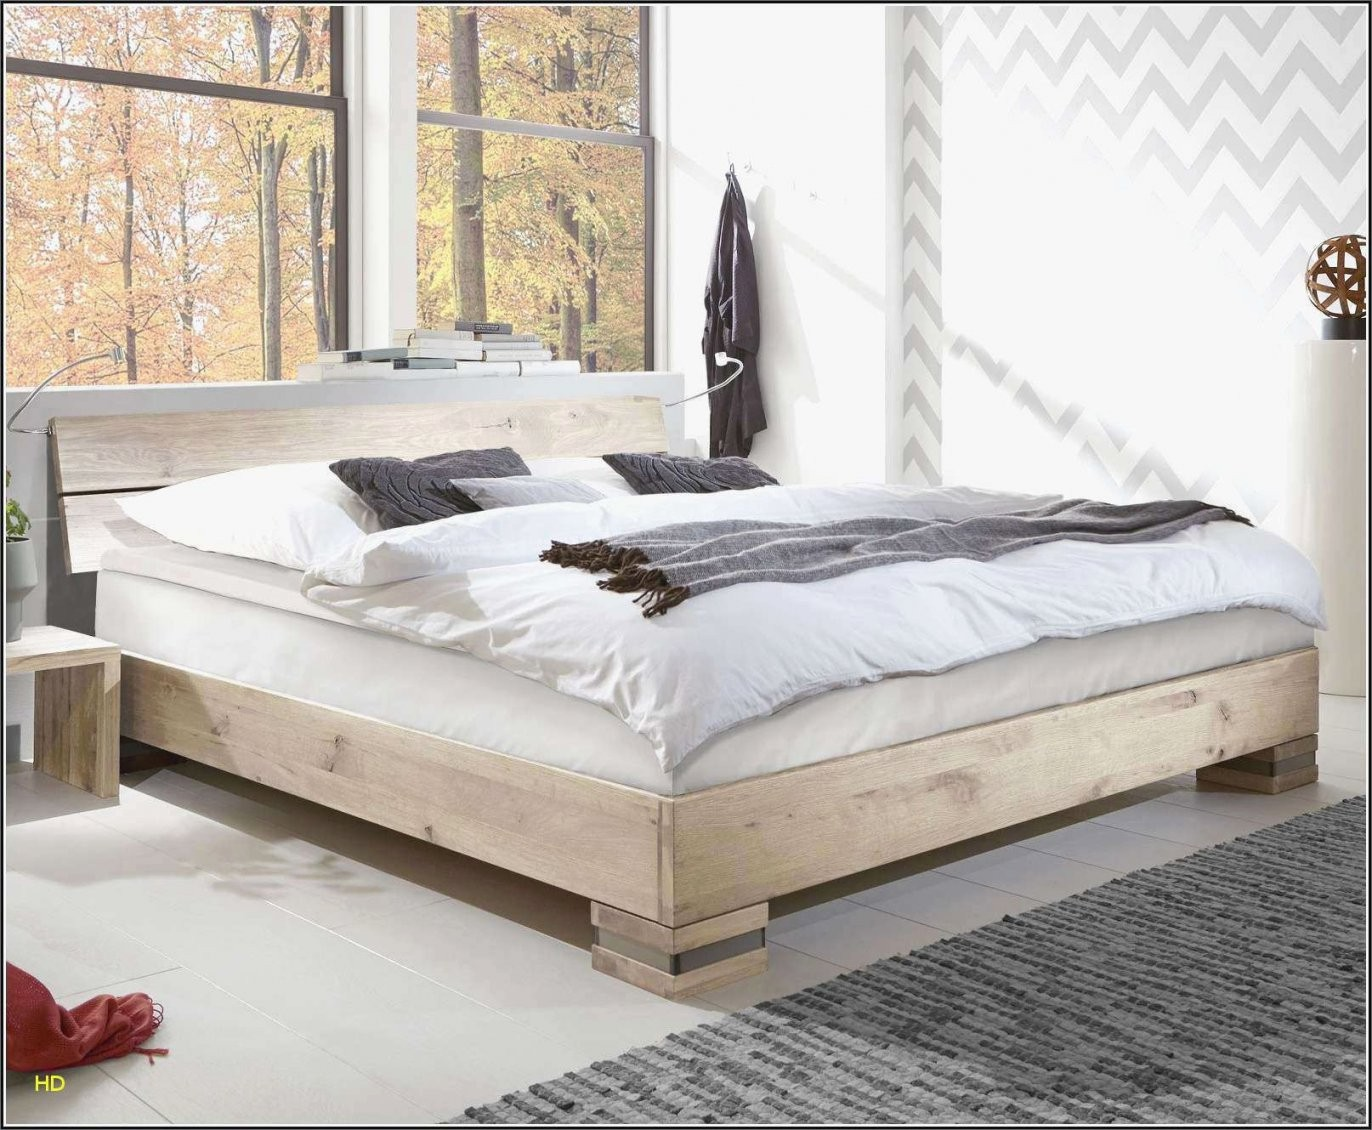 otto bett 140x200 haus bauen. Black Bedroom Furniture Sets. Home Design Ideas